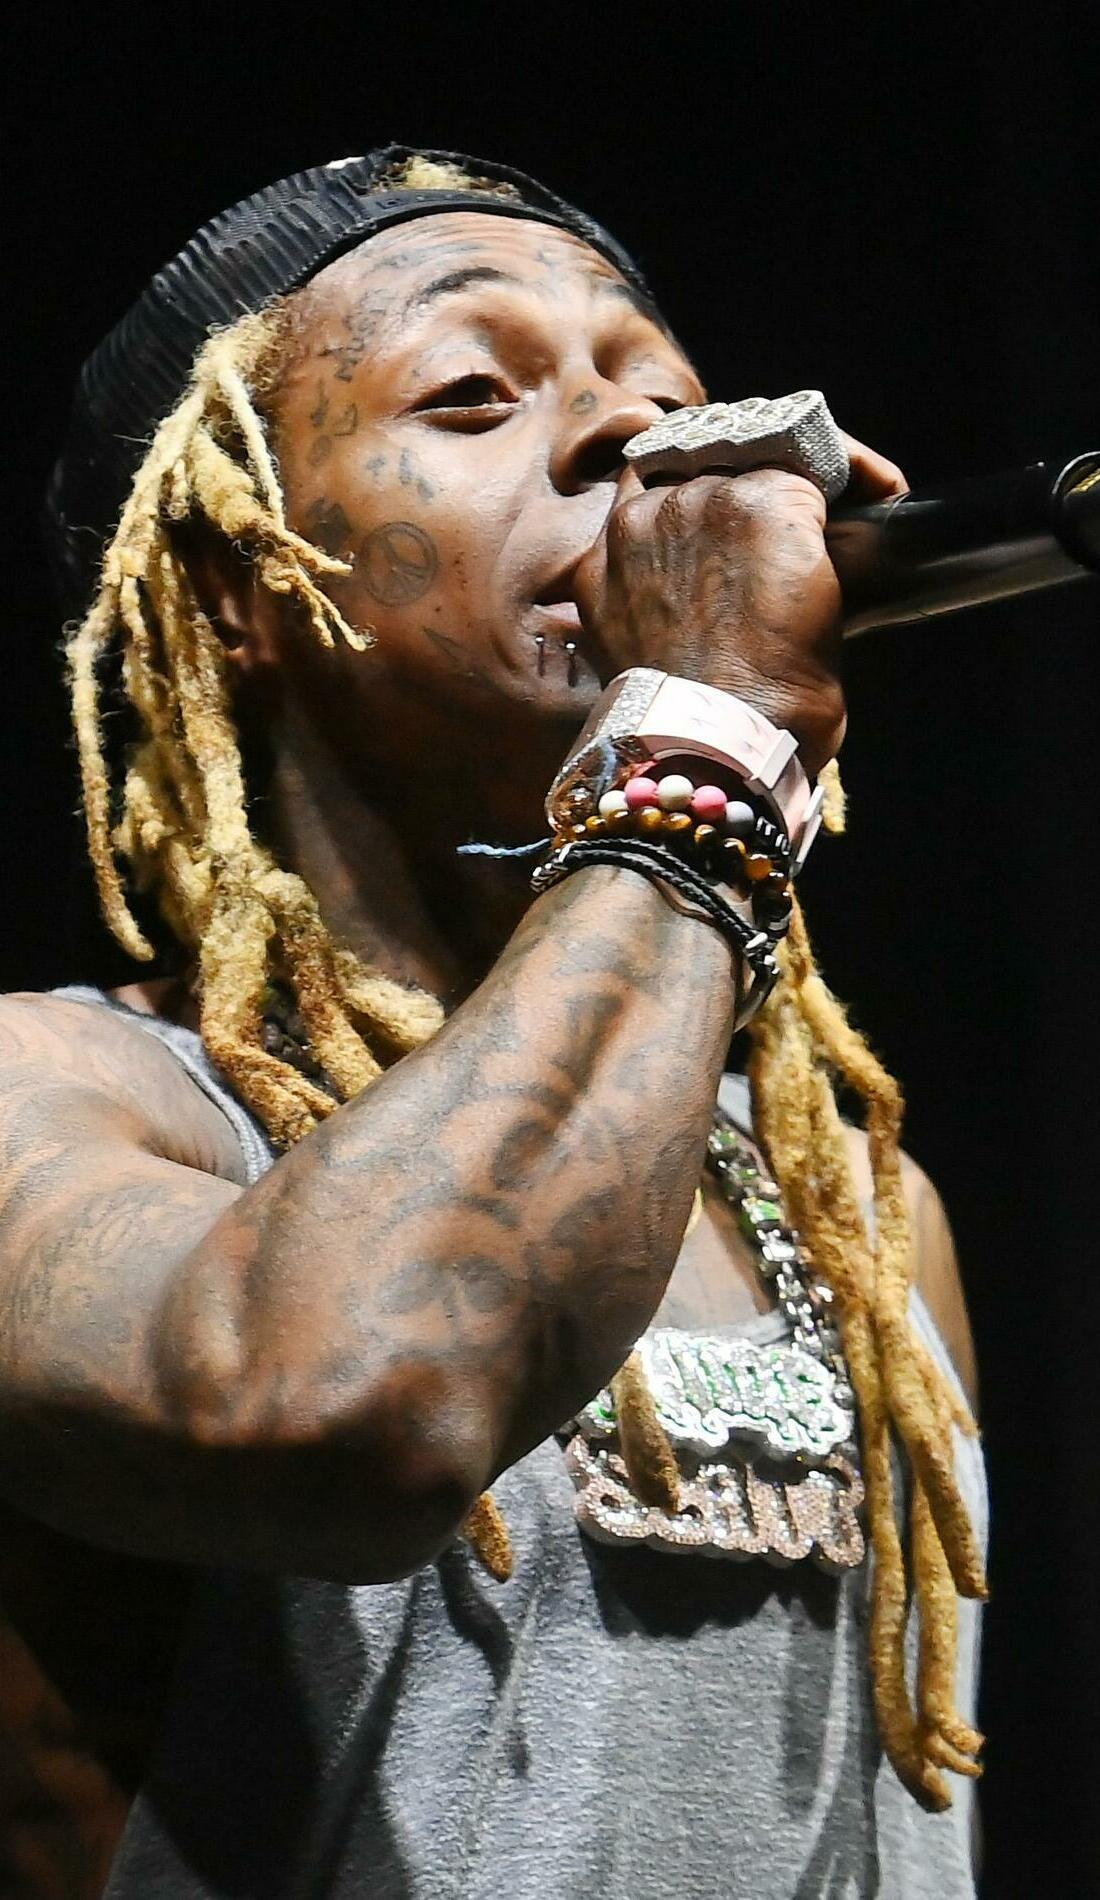 A Lil Wayne live event